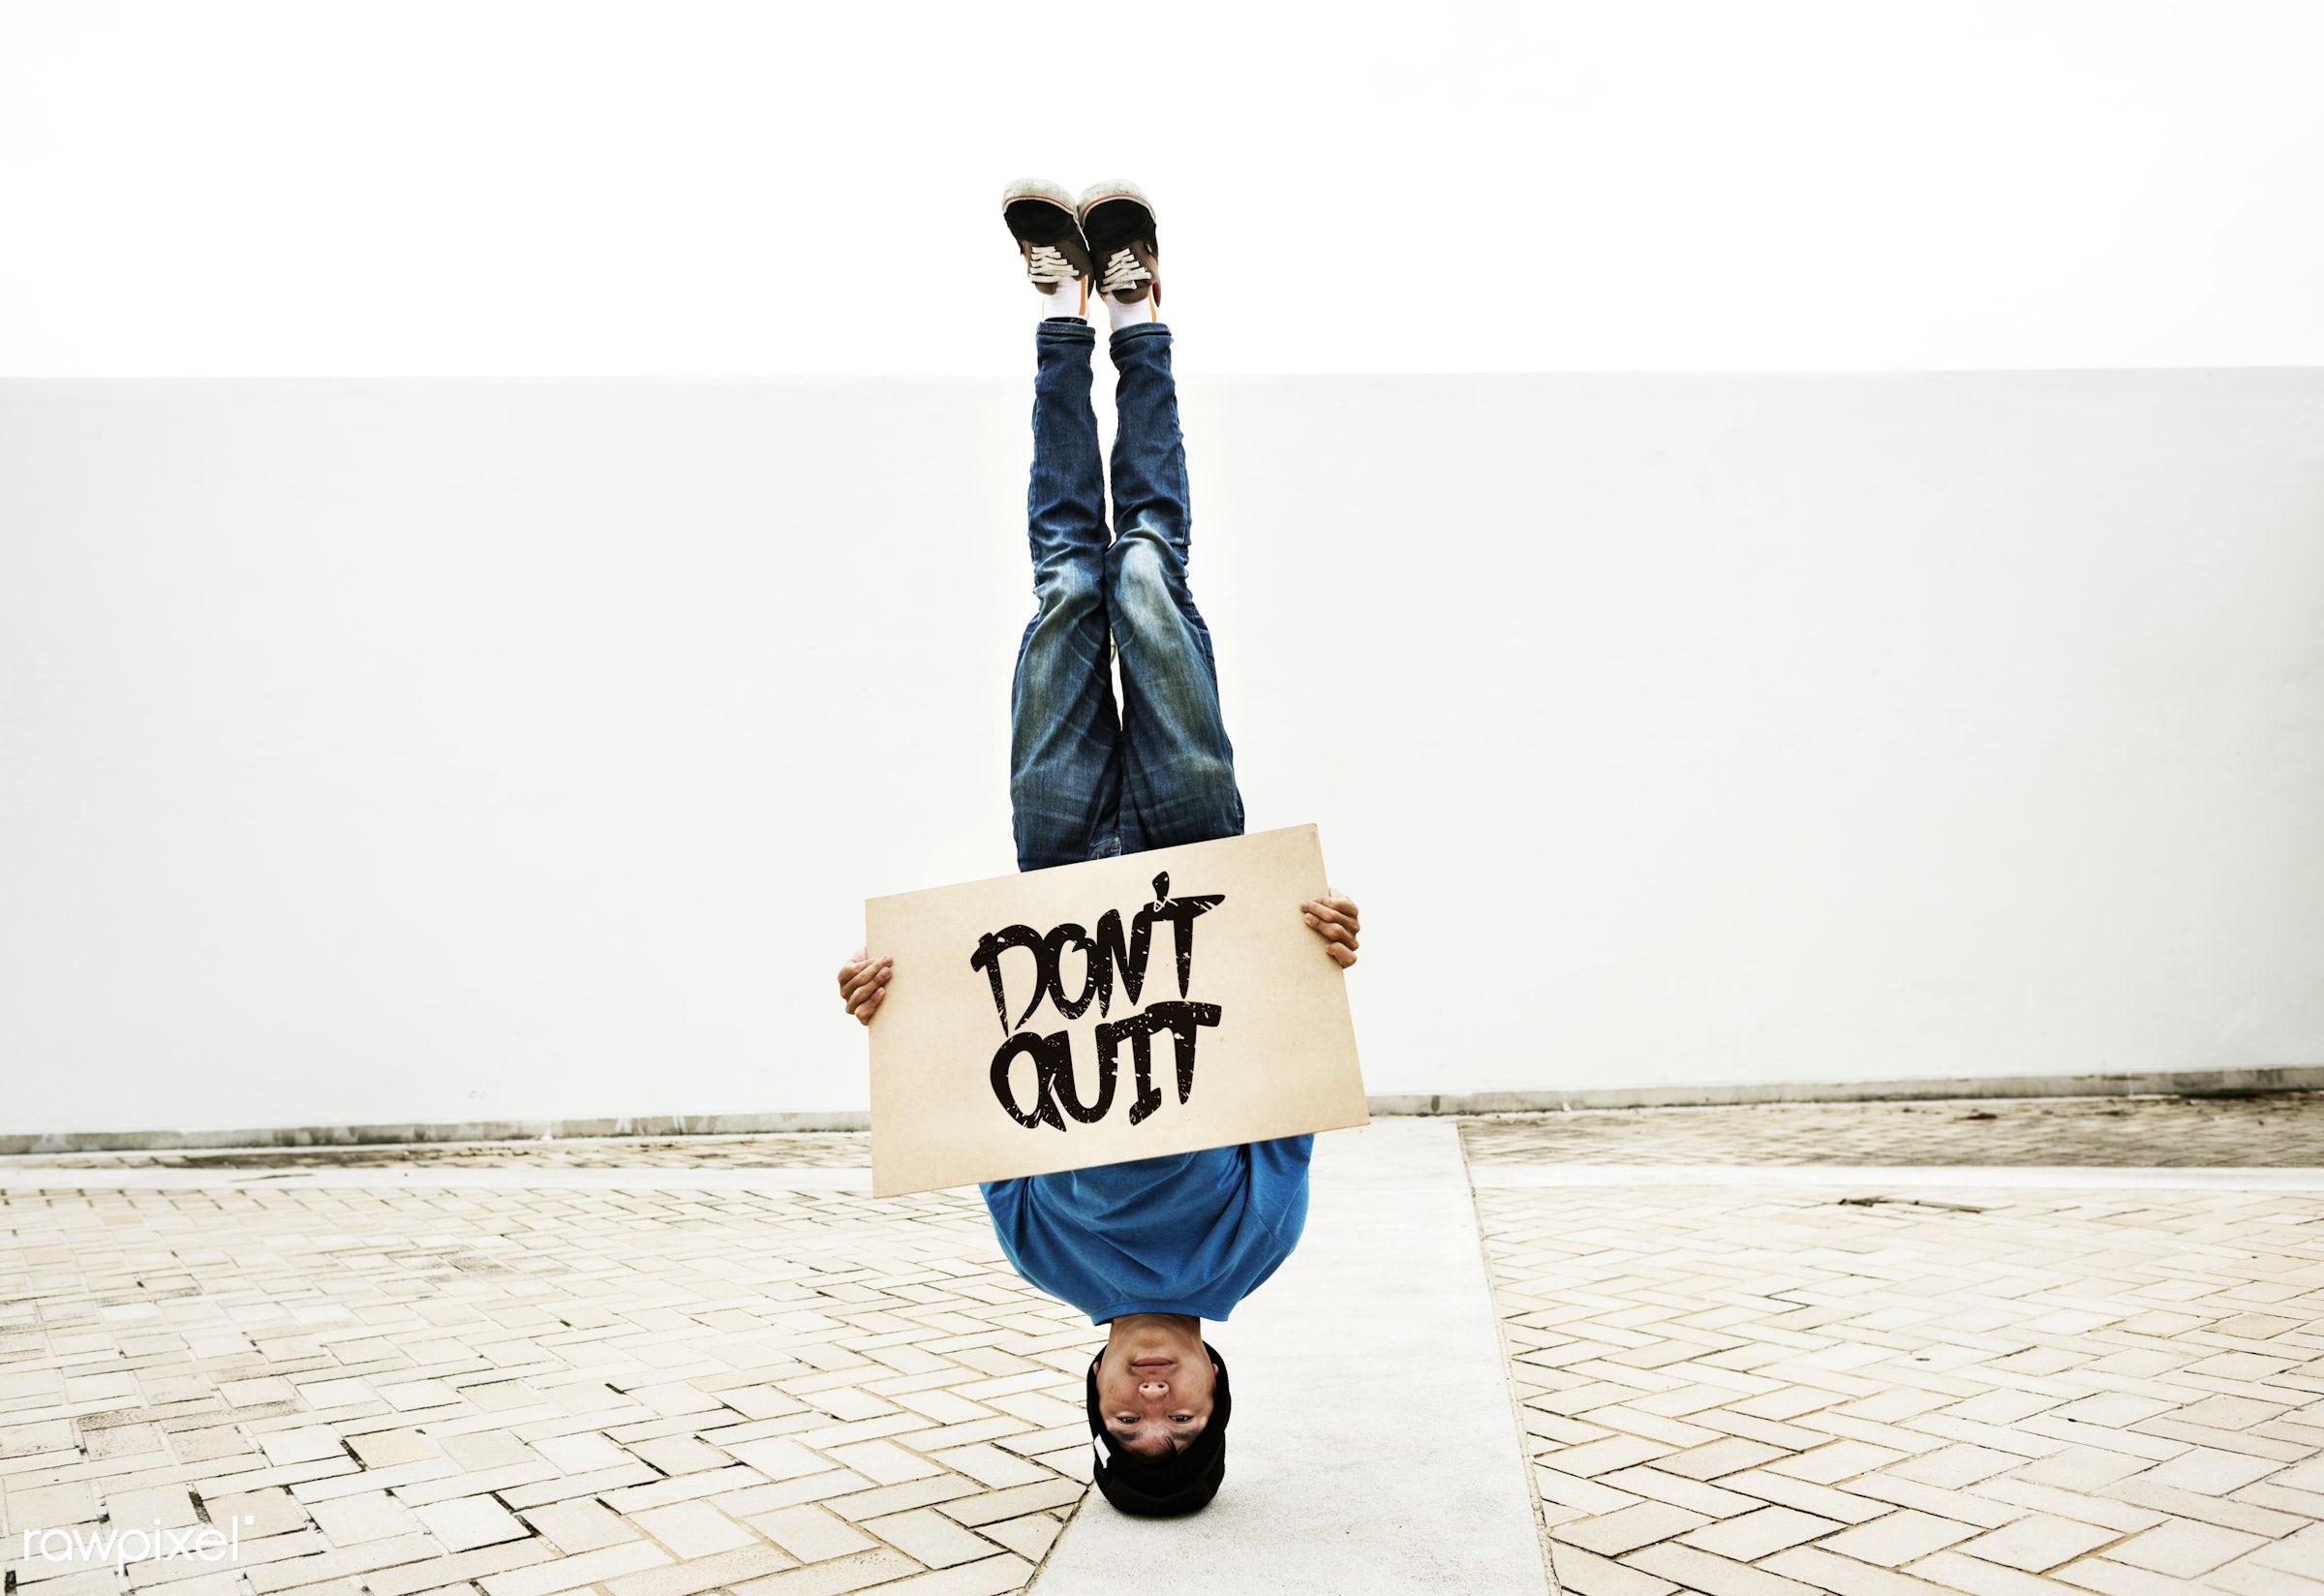 Young man breakdancing - dance, stop, lifestyle, inspiring, fun, announcement, asian, b-boying, believe in yourself, boy,...